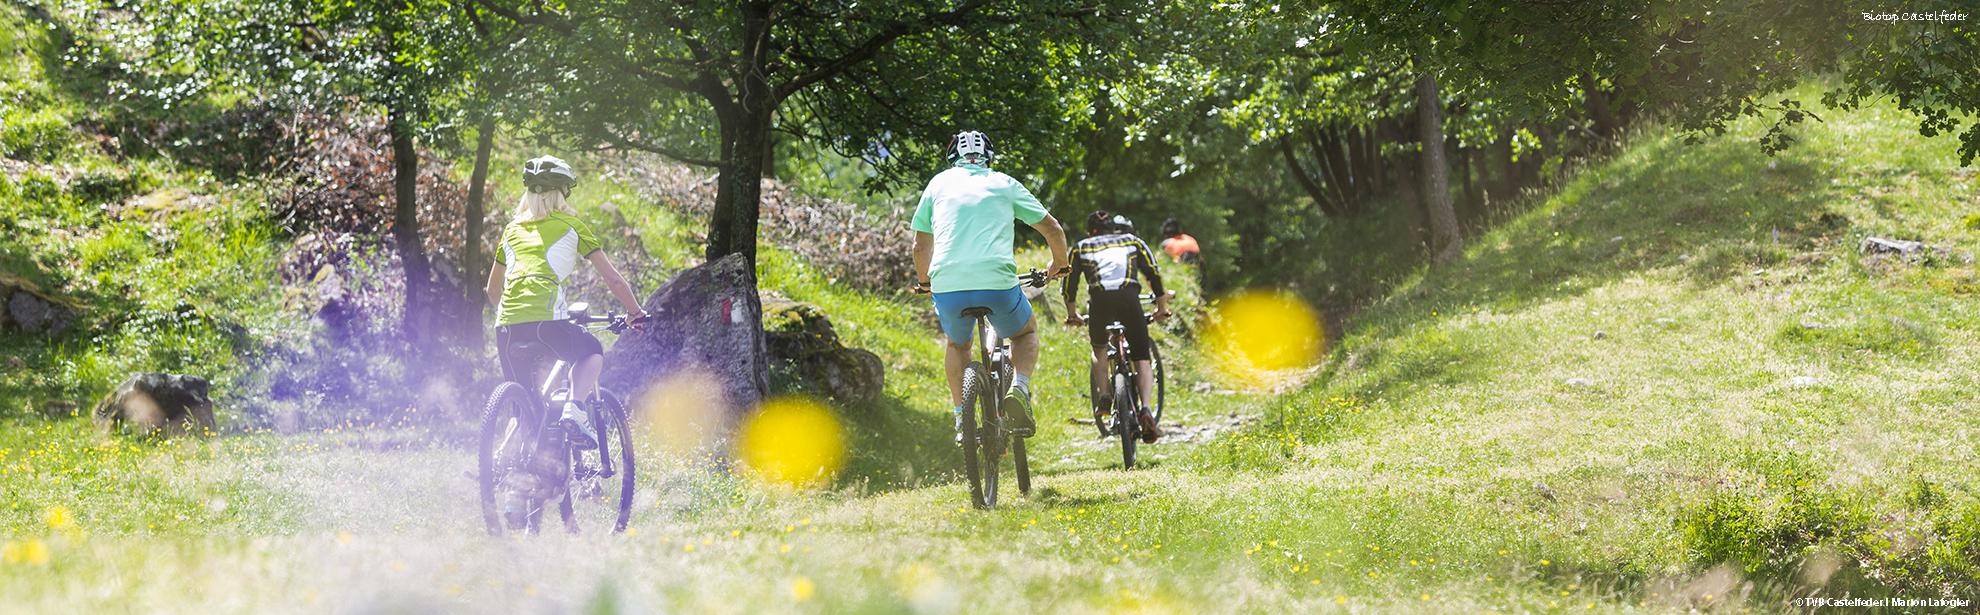 OsportTVB-Castelfeder_Marion-Lafogler_Naturpark-Castelfeder_S5A7616